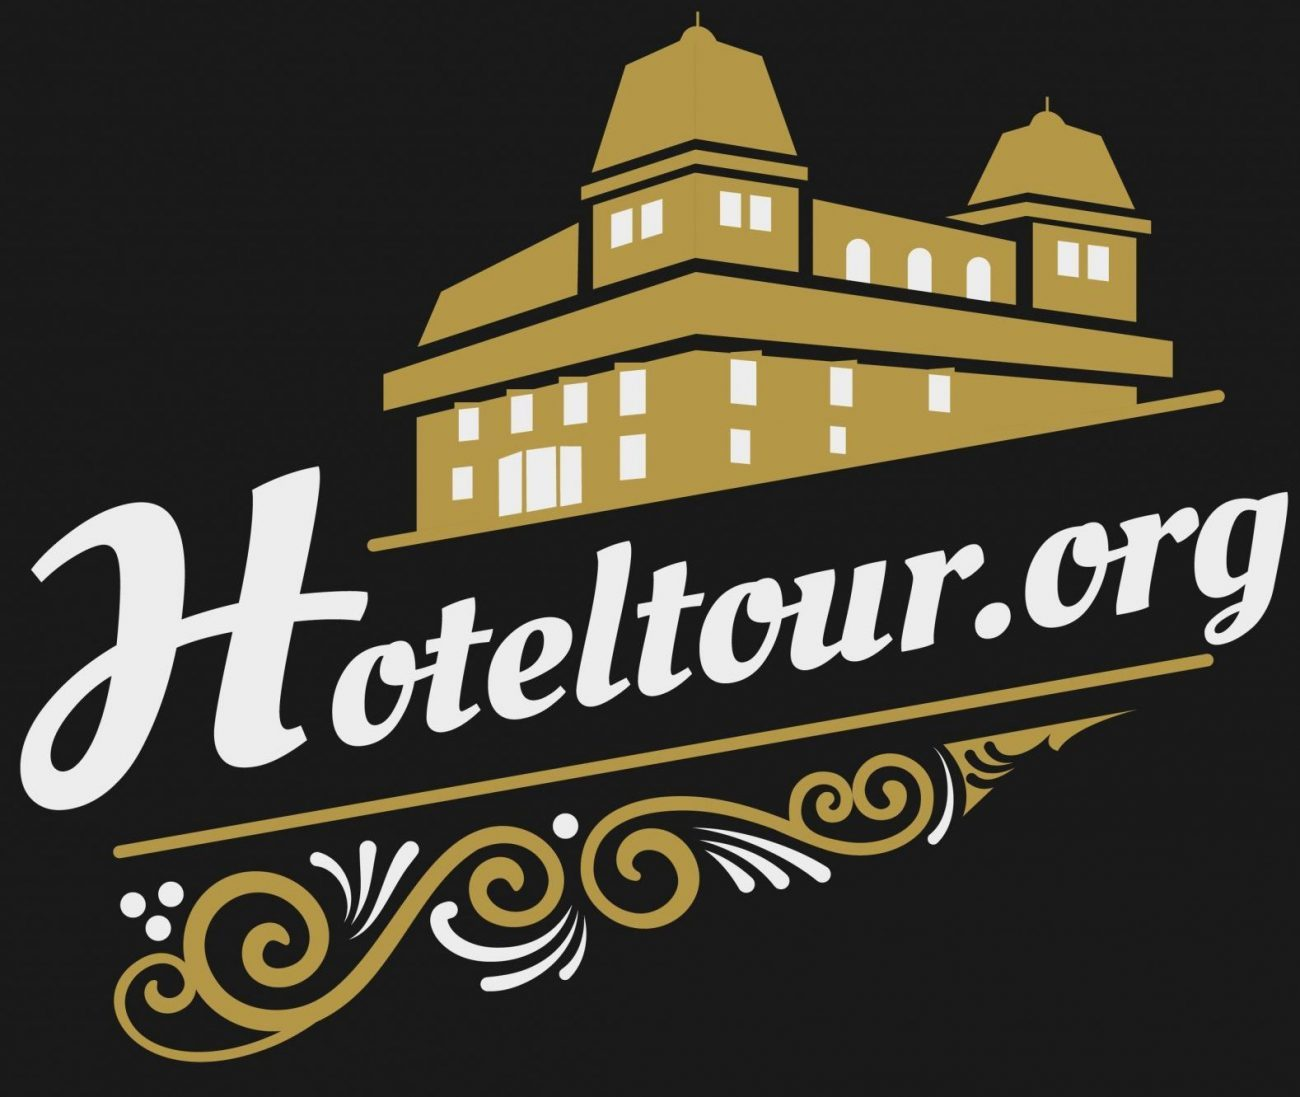 Hoteltour